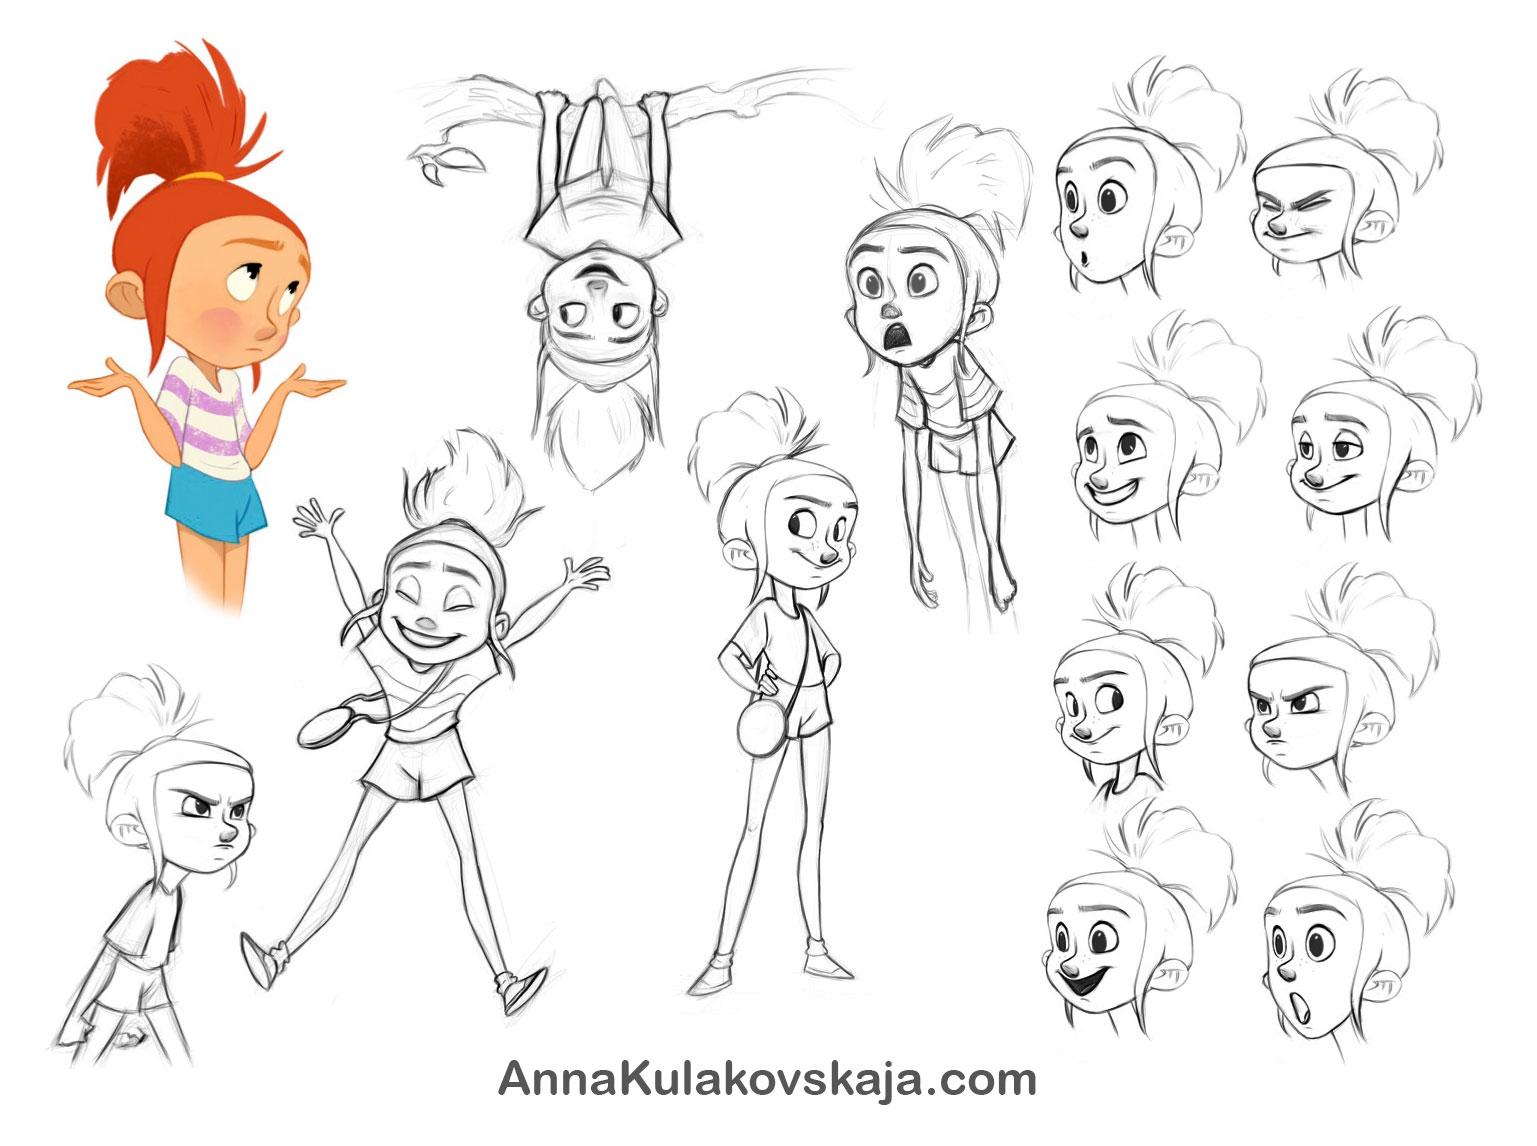 Anna-Kulakovskaja_Character-Designer_Hi-Res_linkedin.jpg